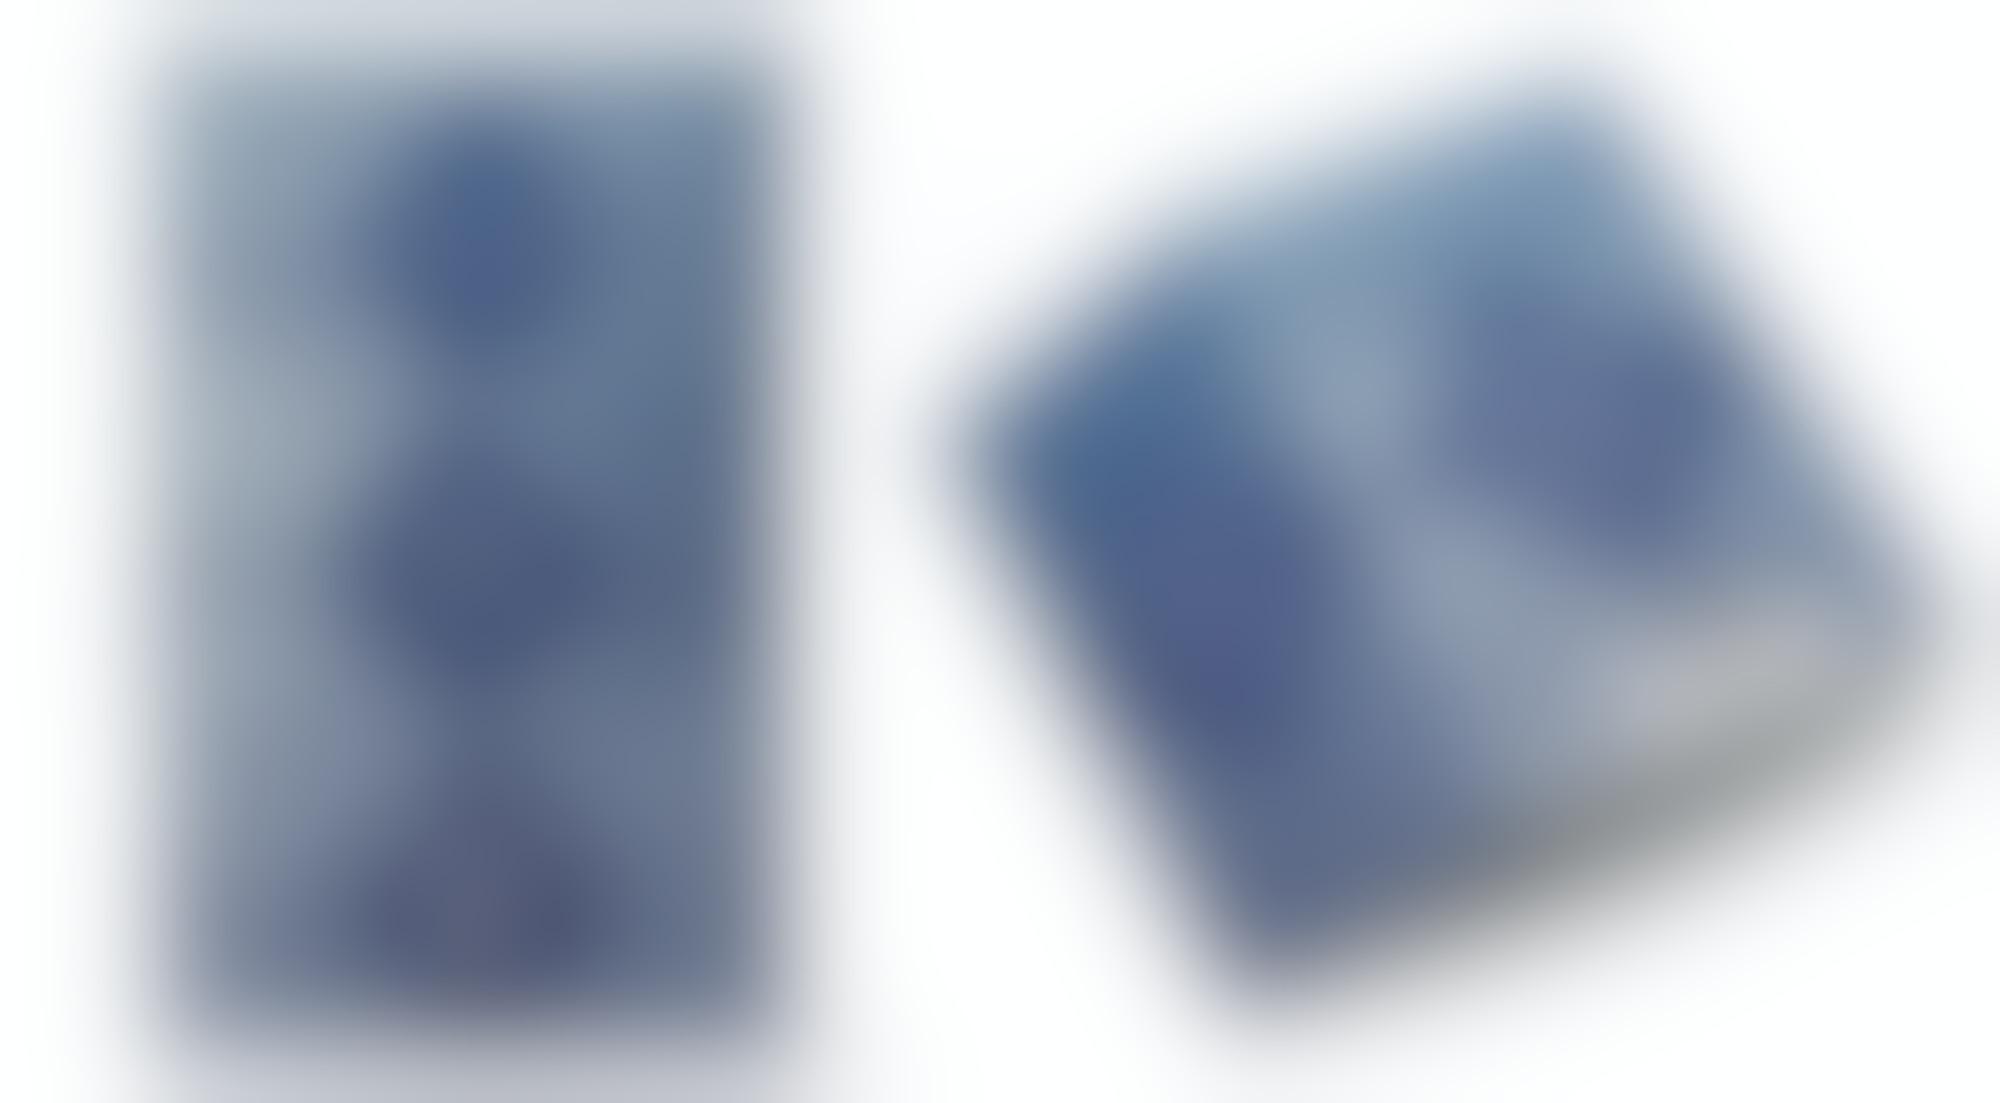 YT7 autocompressfitresizeixlibphp 1 1 0max h2000max w3 D2000q80s2d36bb1b175e6012ecaa9ffbd0294ba8